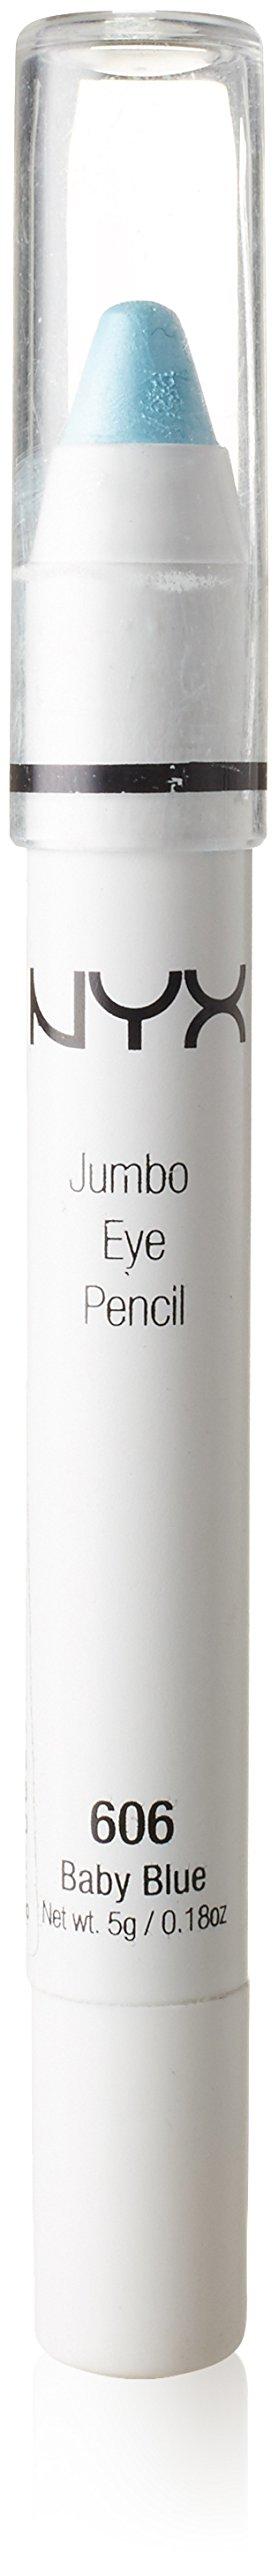 NYX Jumbo Eye Pencil Shadow Liner 606 Baby Blue